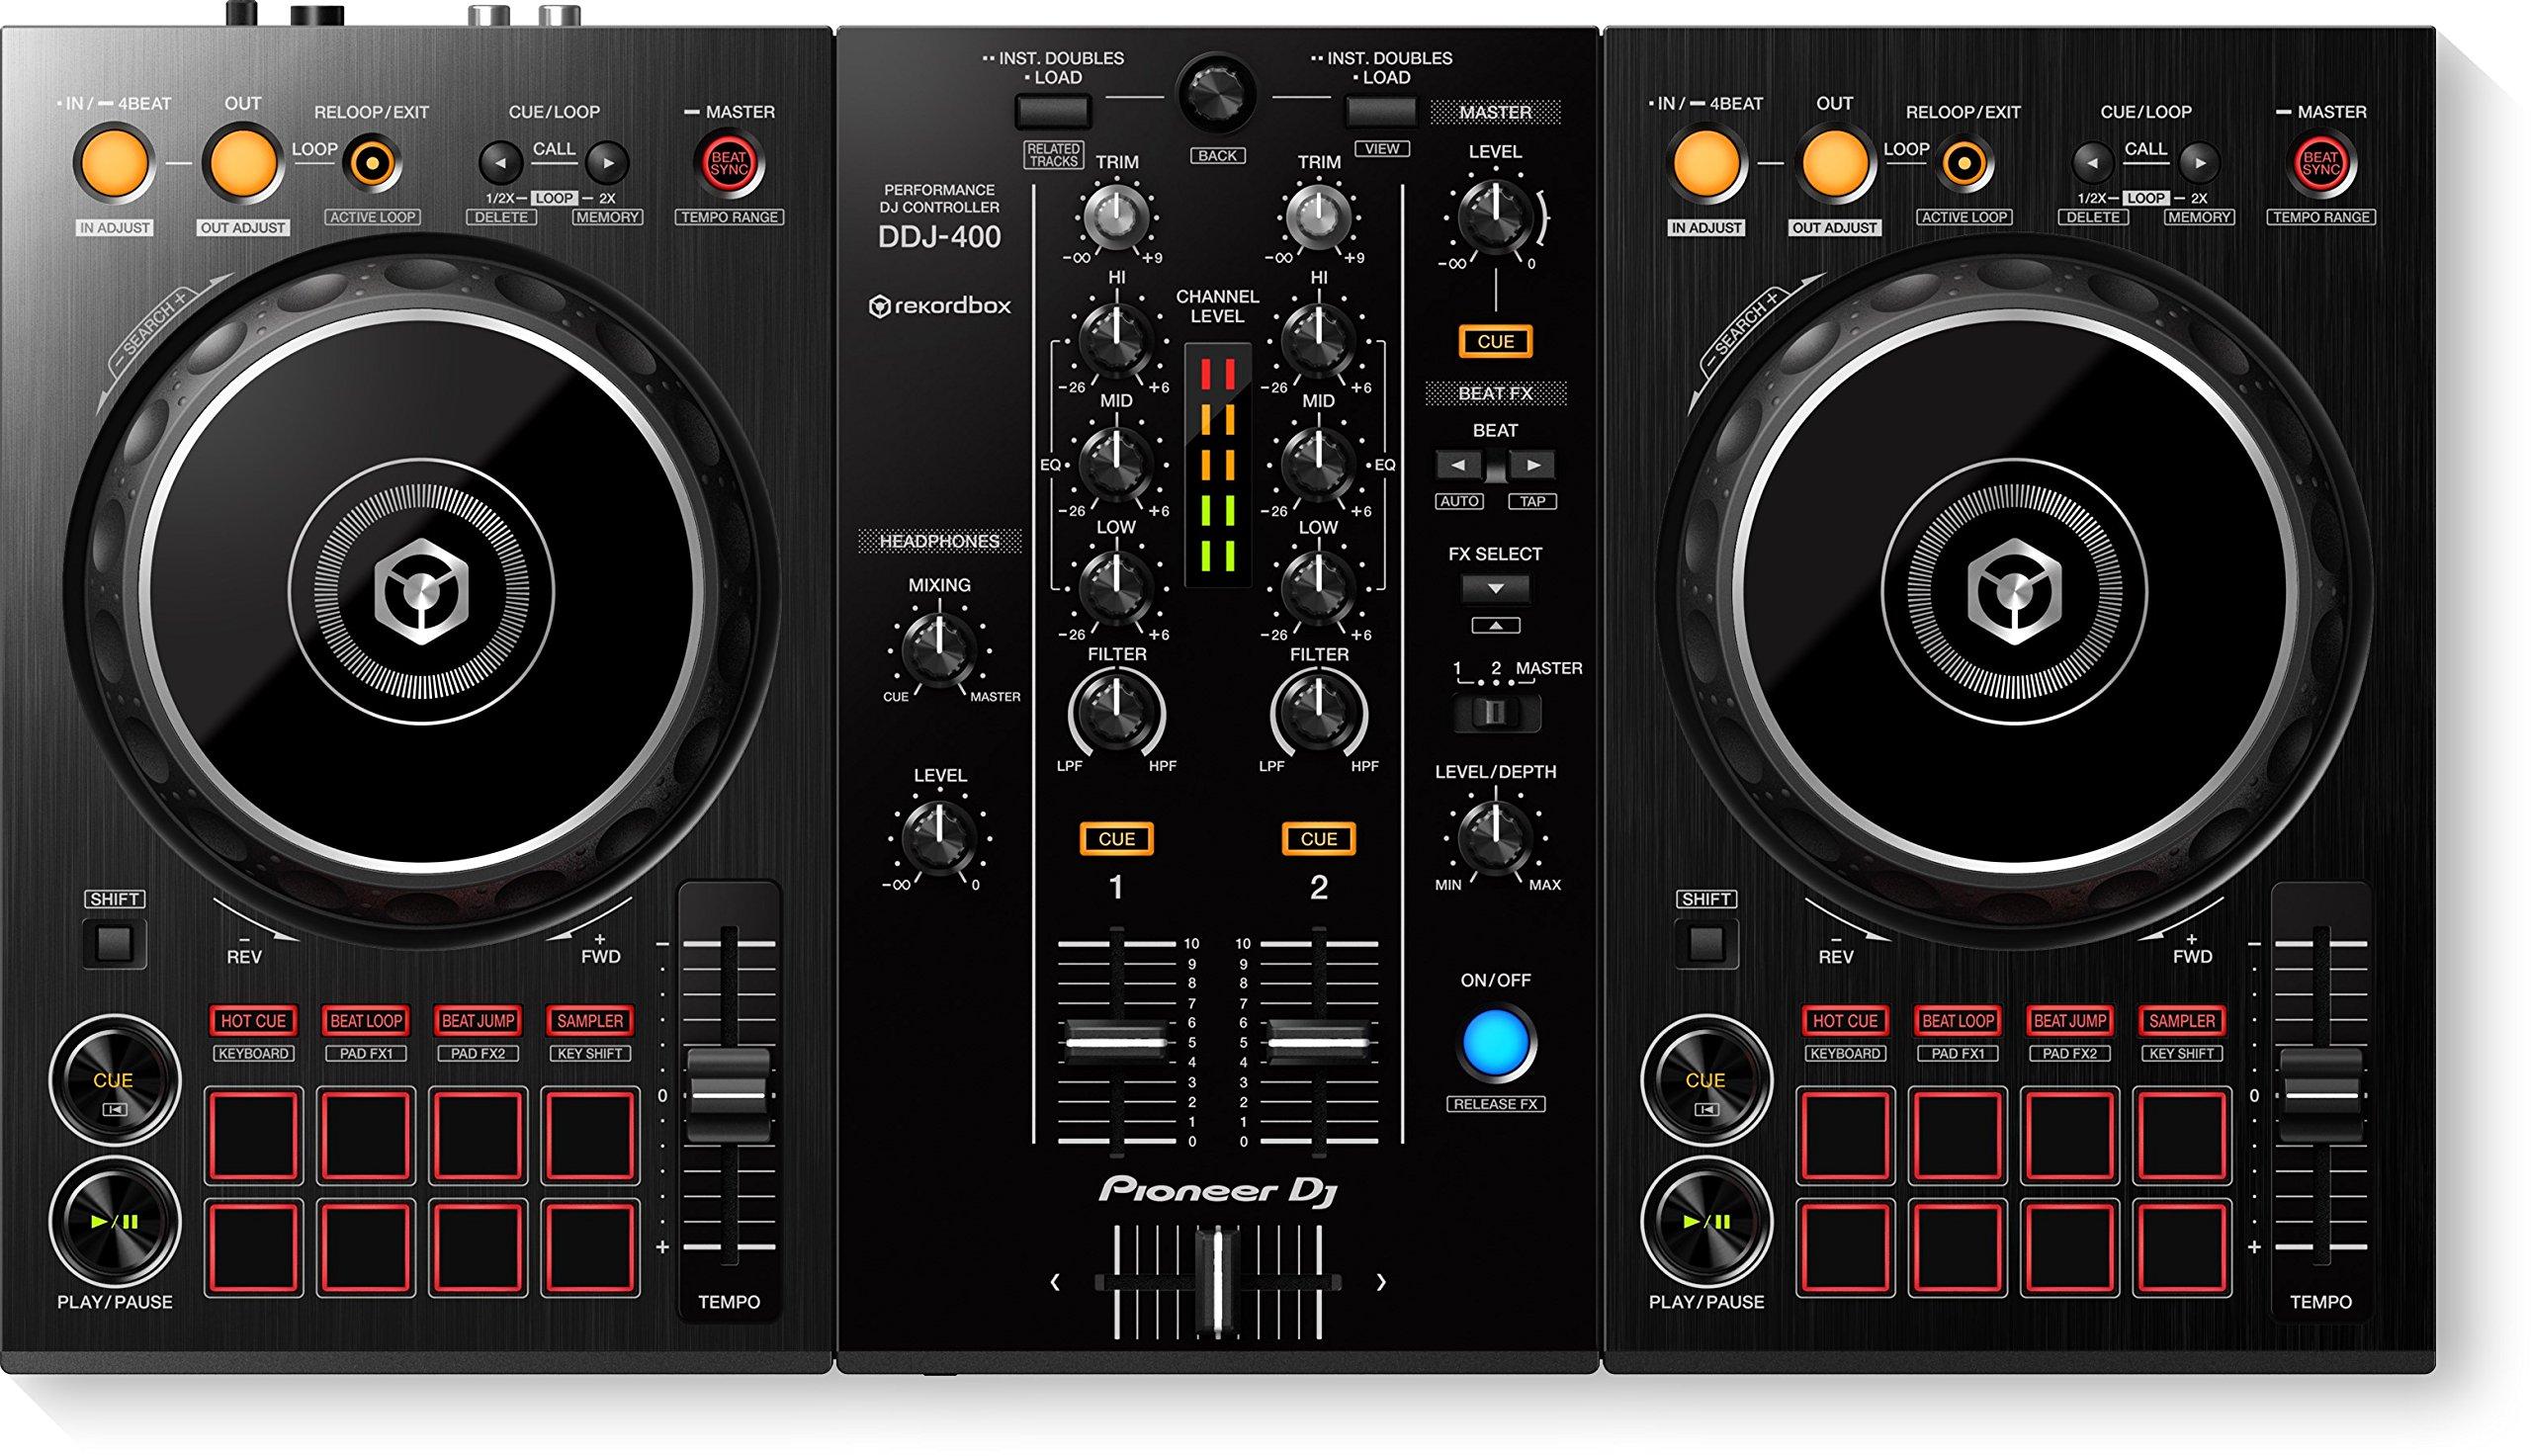 Pioneer DJ DJ Controller (DDJ-400) by Pioneer DJ (Image #1)